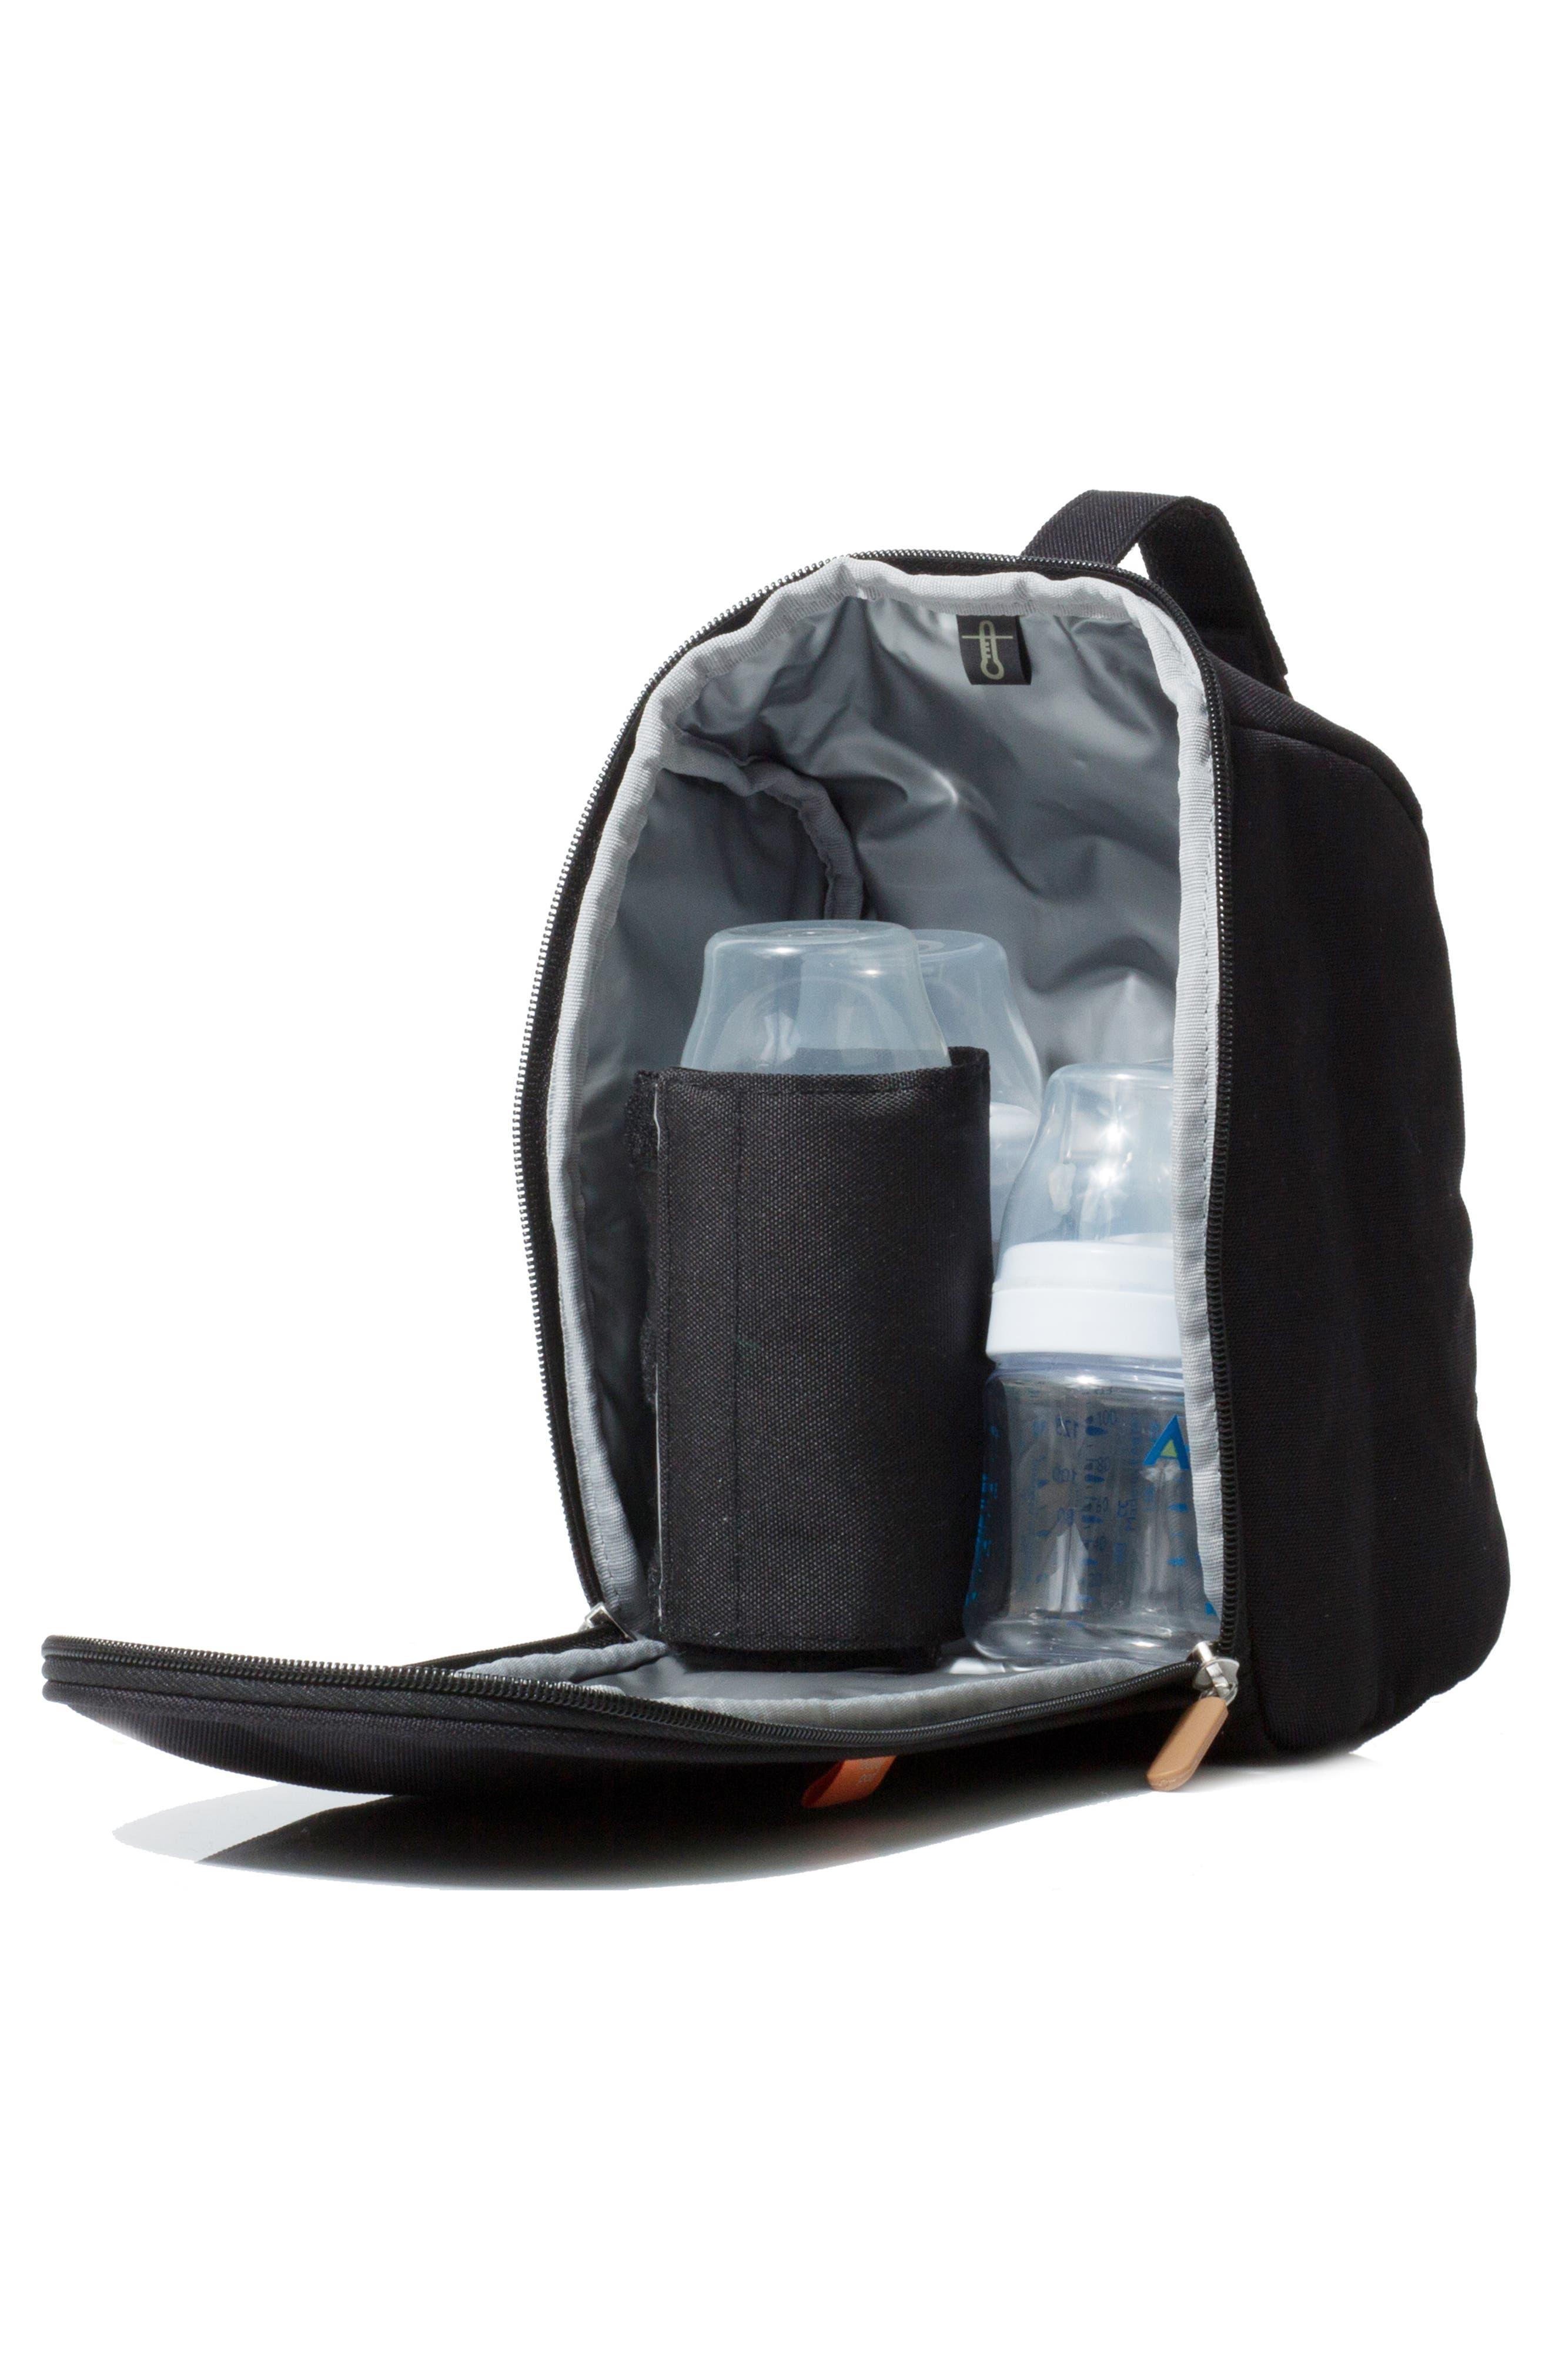 Picos Pack Diaper Backpack,                             Alternate thumbnail 6, color,                             Black Charcoal